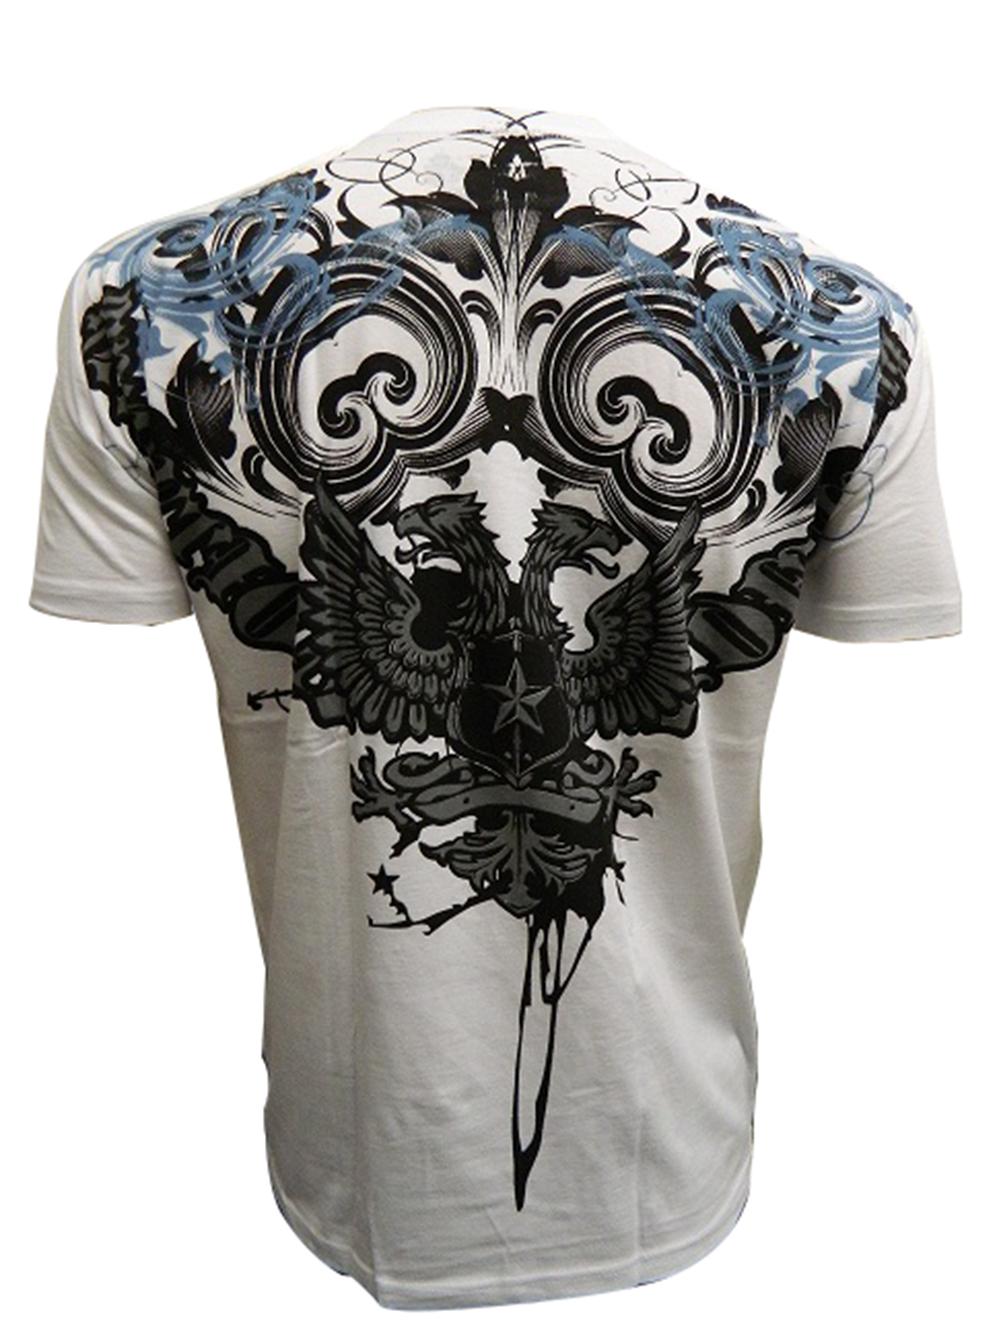 Konflic-Men-039-s-Double-Headed-Revolution-Bird-Graphic-Designer-MMA-T-Shirt thumbnail 4